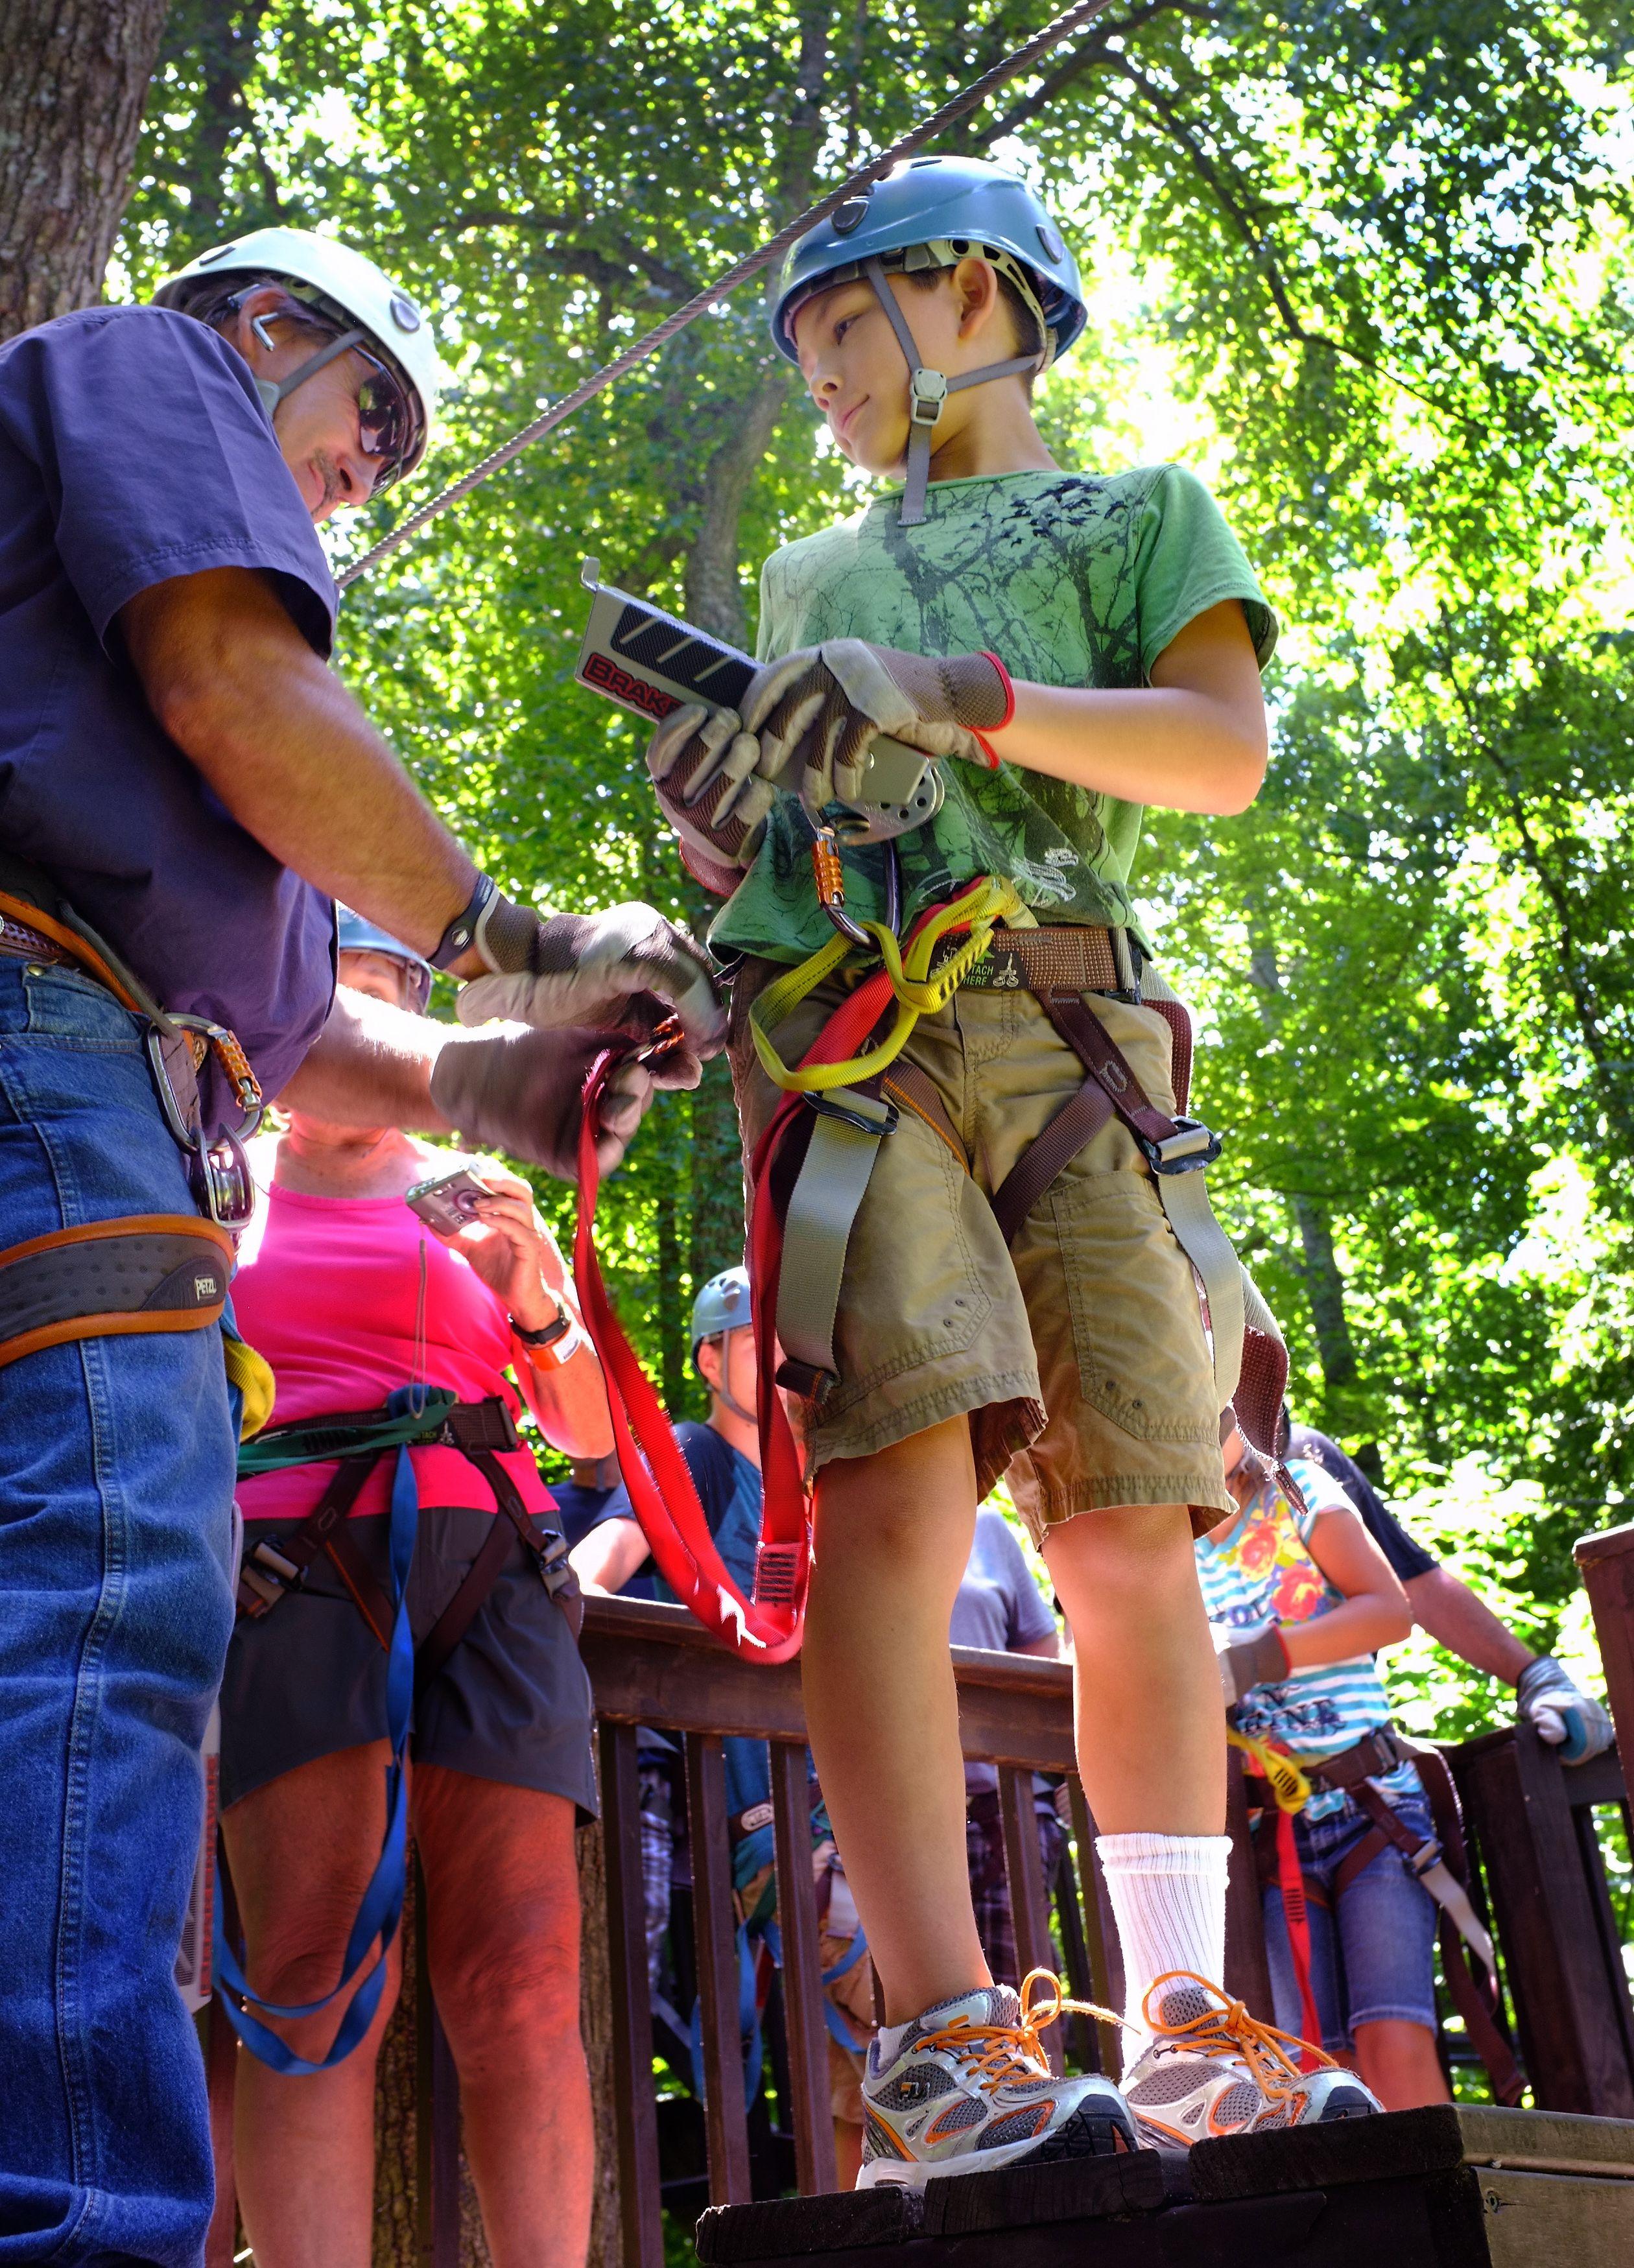 Kentucky Action Park Twin Zipline Cave City Ziplining Kentucky